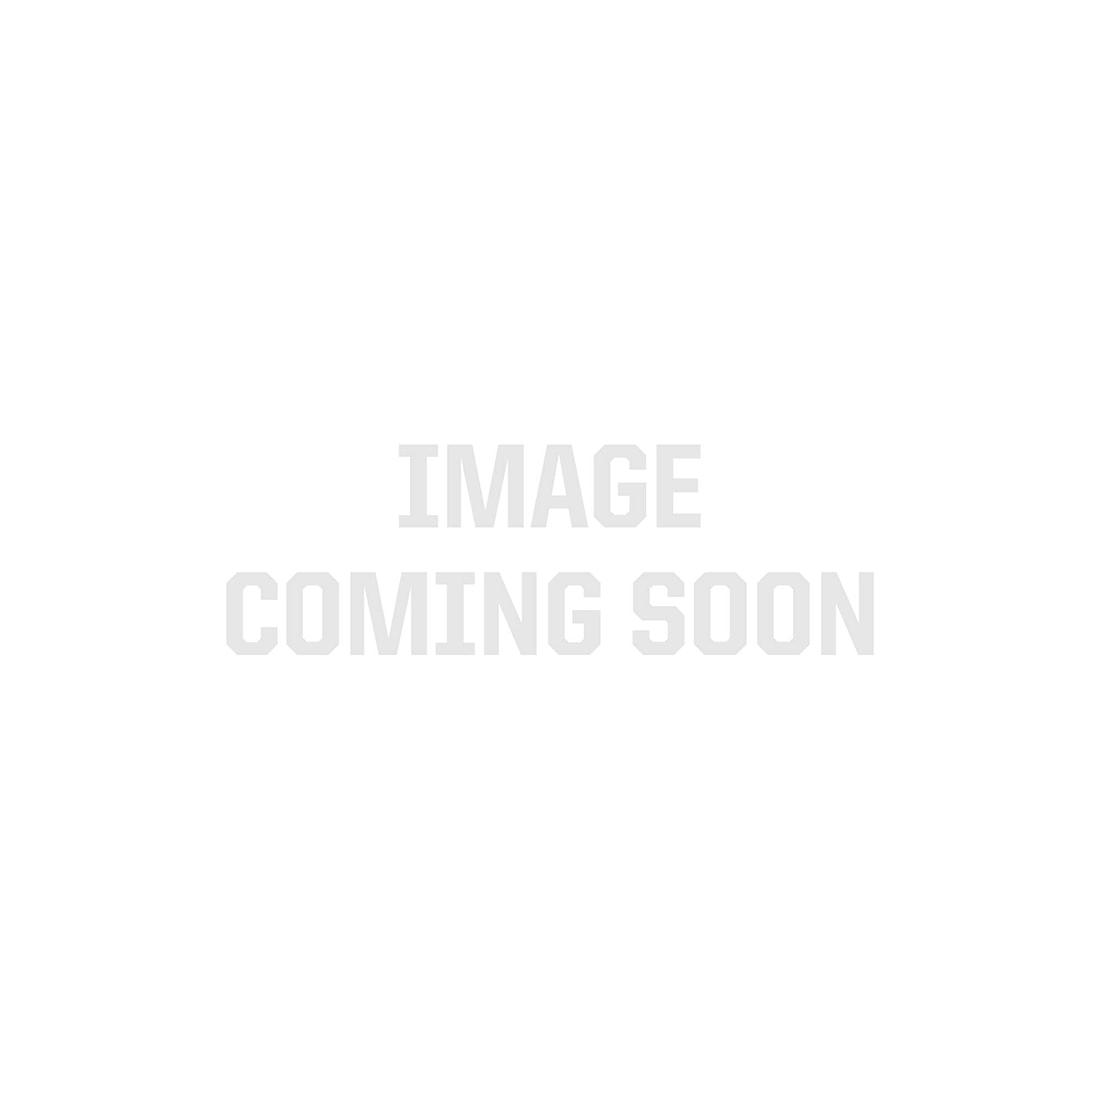 S14 Frosted Glass Dimmable LED Light Bulb, E26 (Medium) Base, 1.4 watt (Yellow)